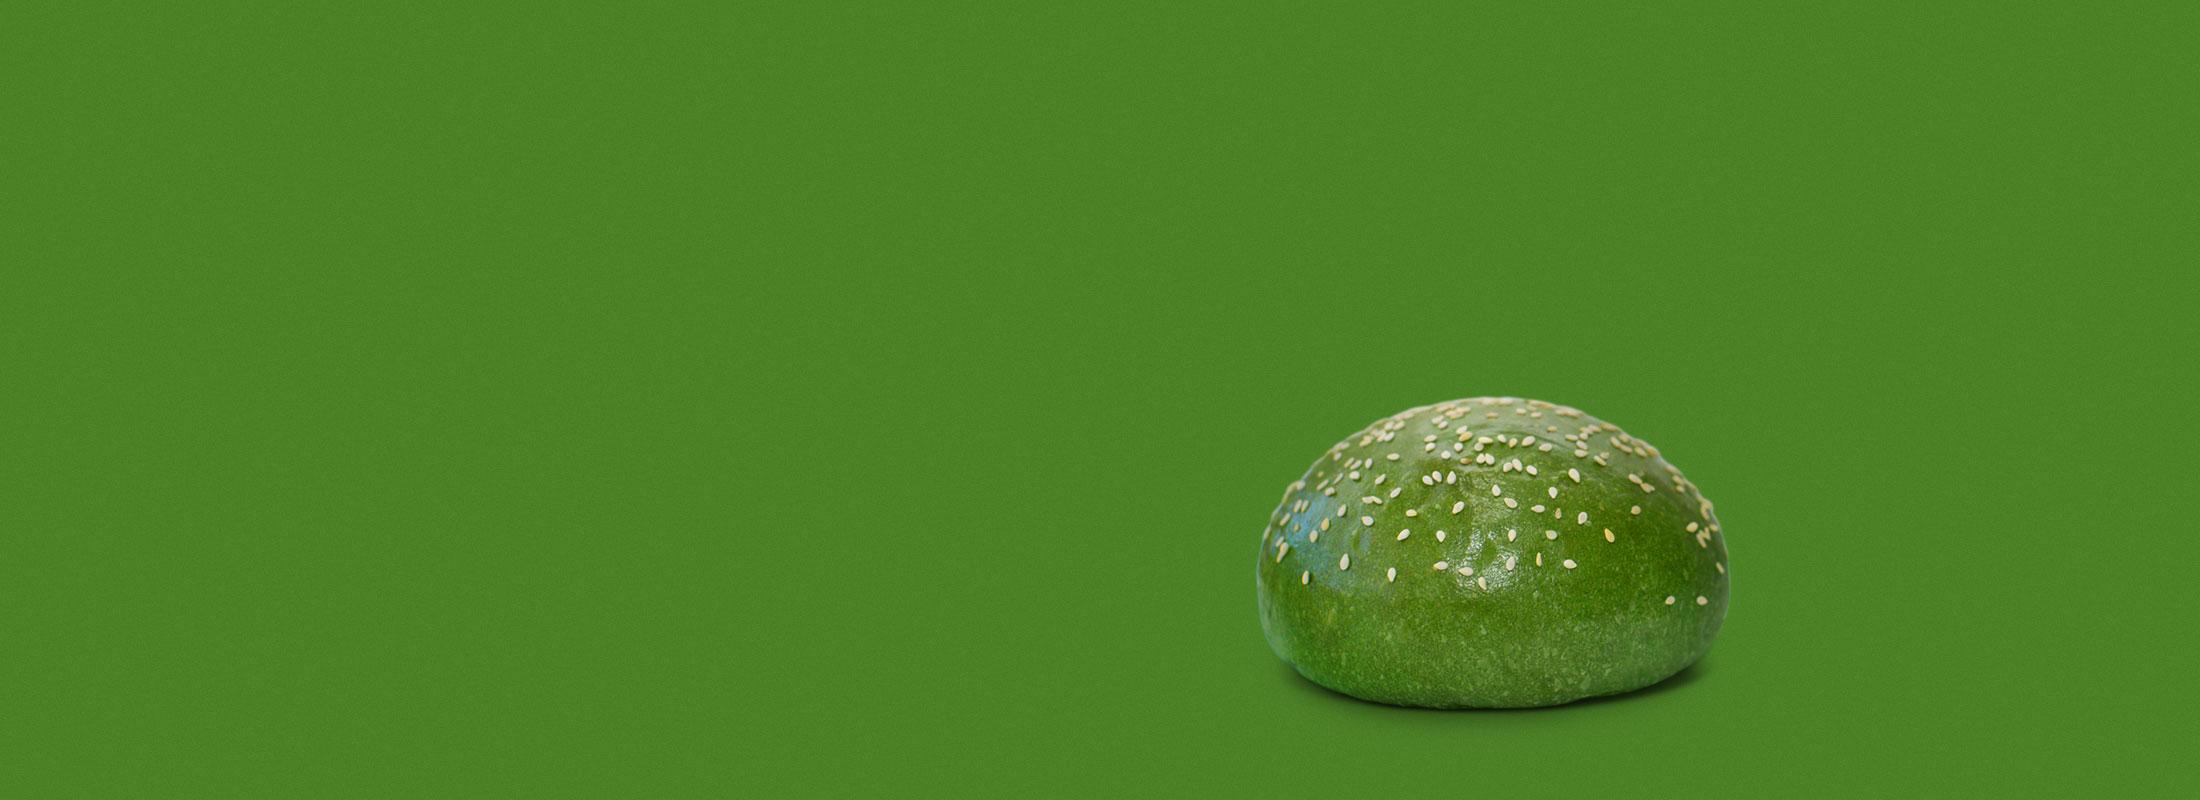 Matcha Green T or Spinach & Kale Bun